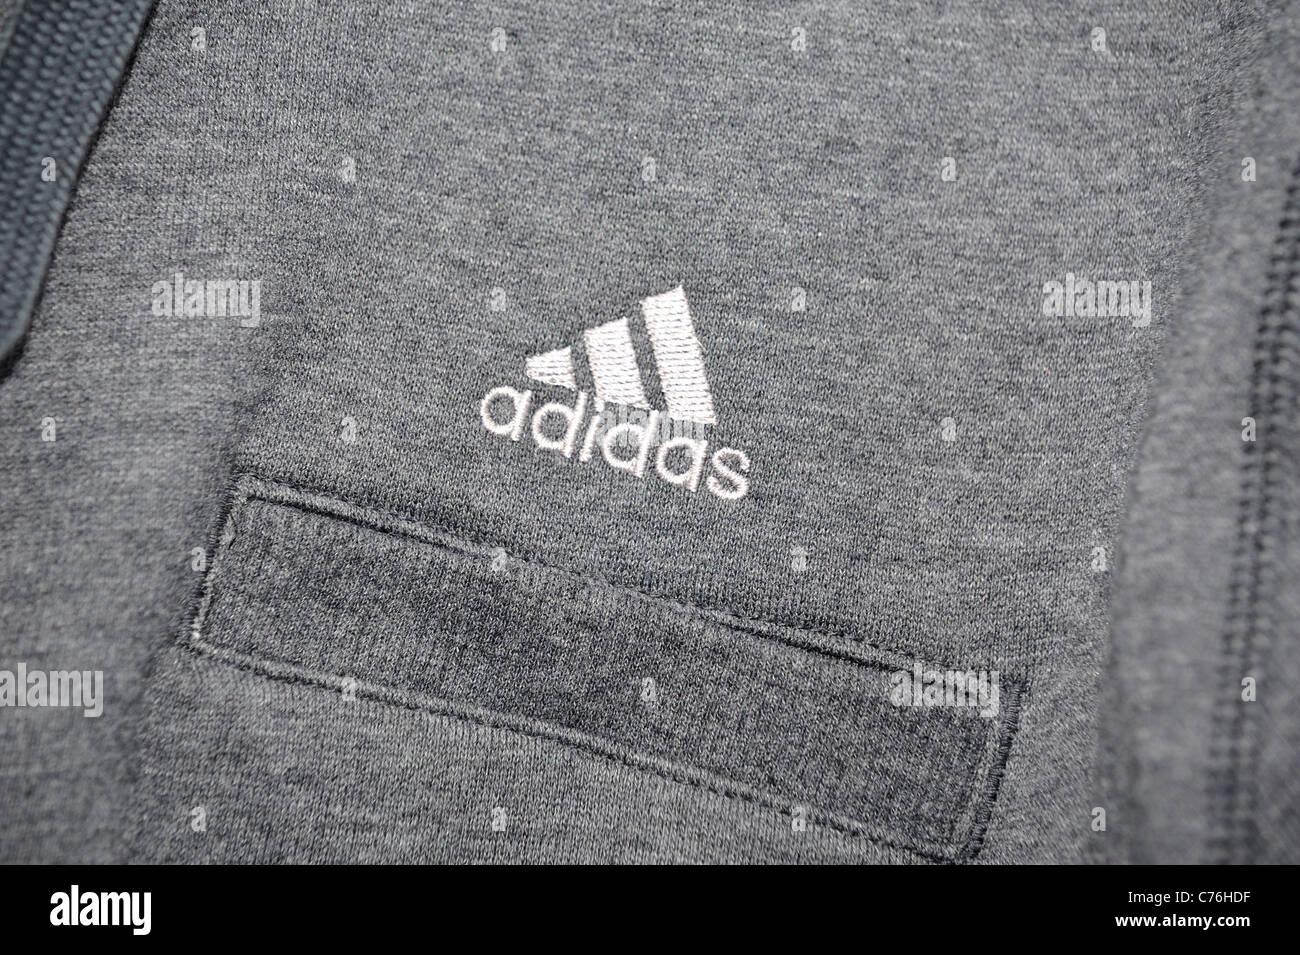 adidas logo on tracksuit top - Stock Image